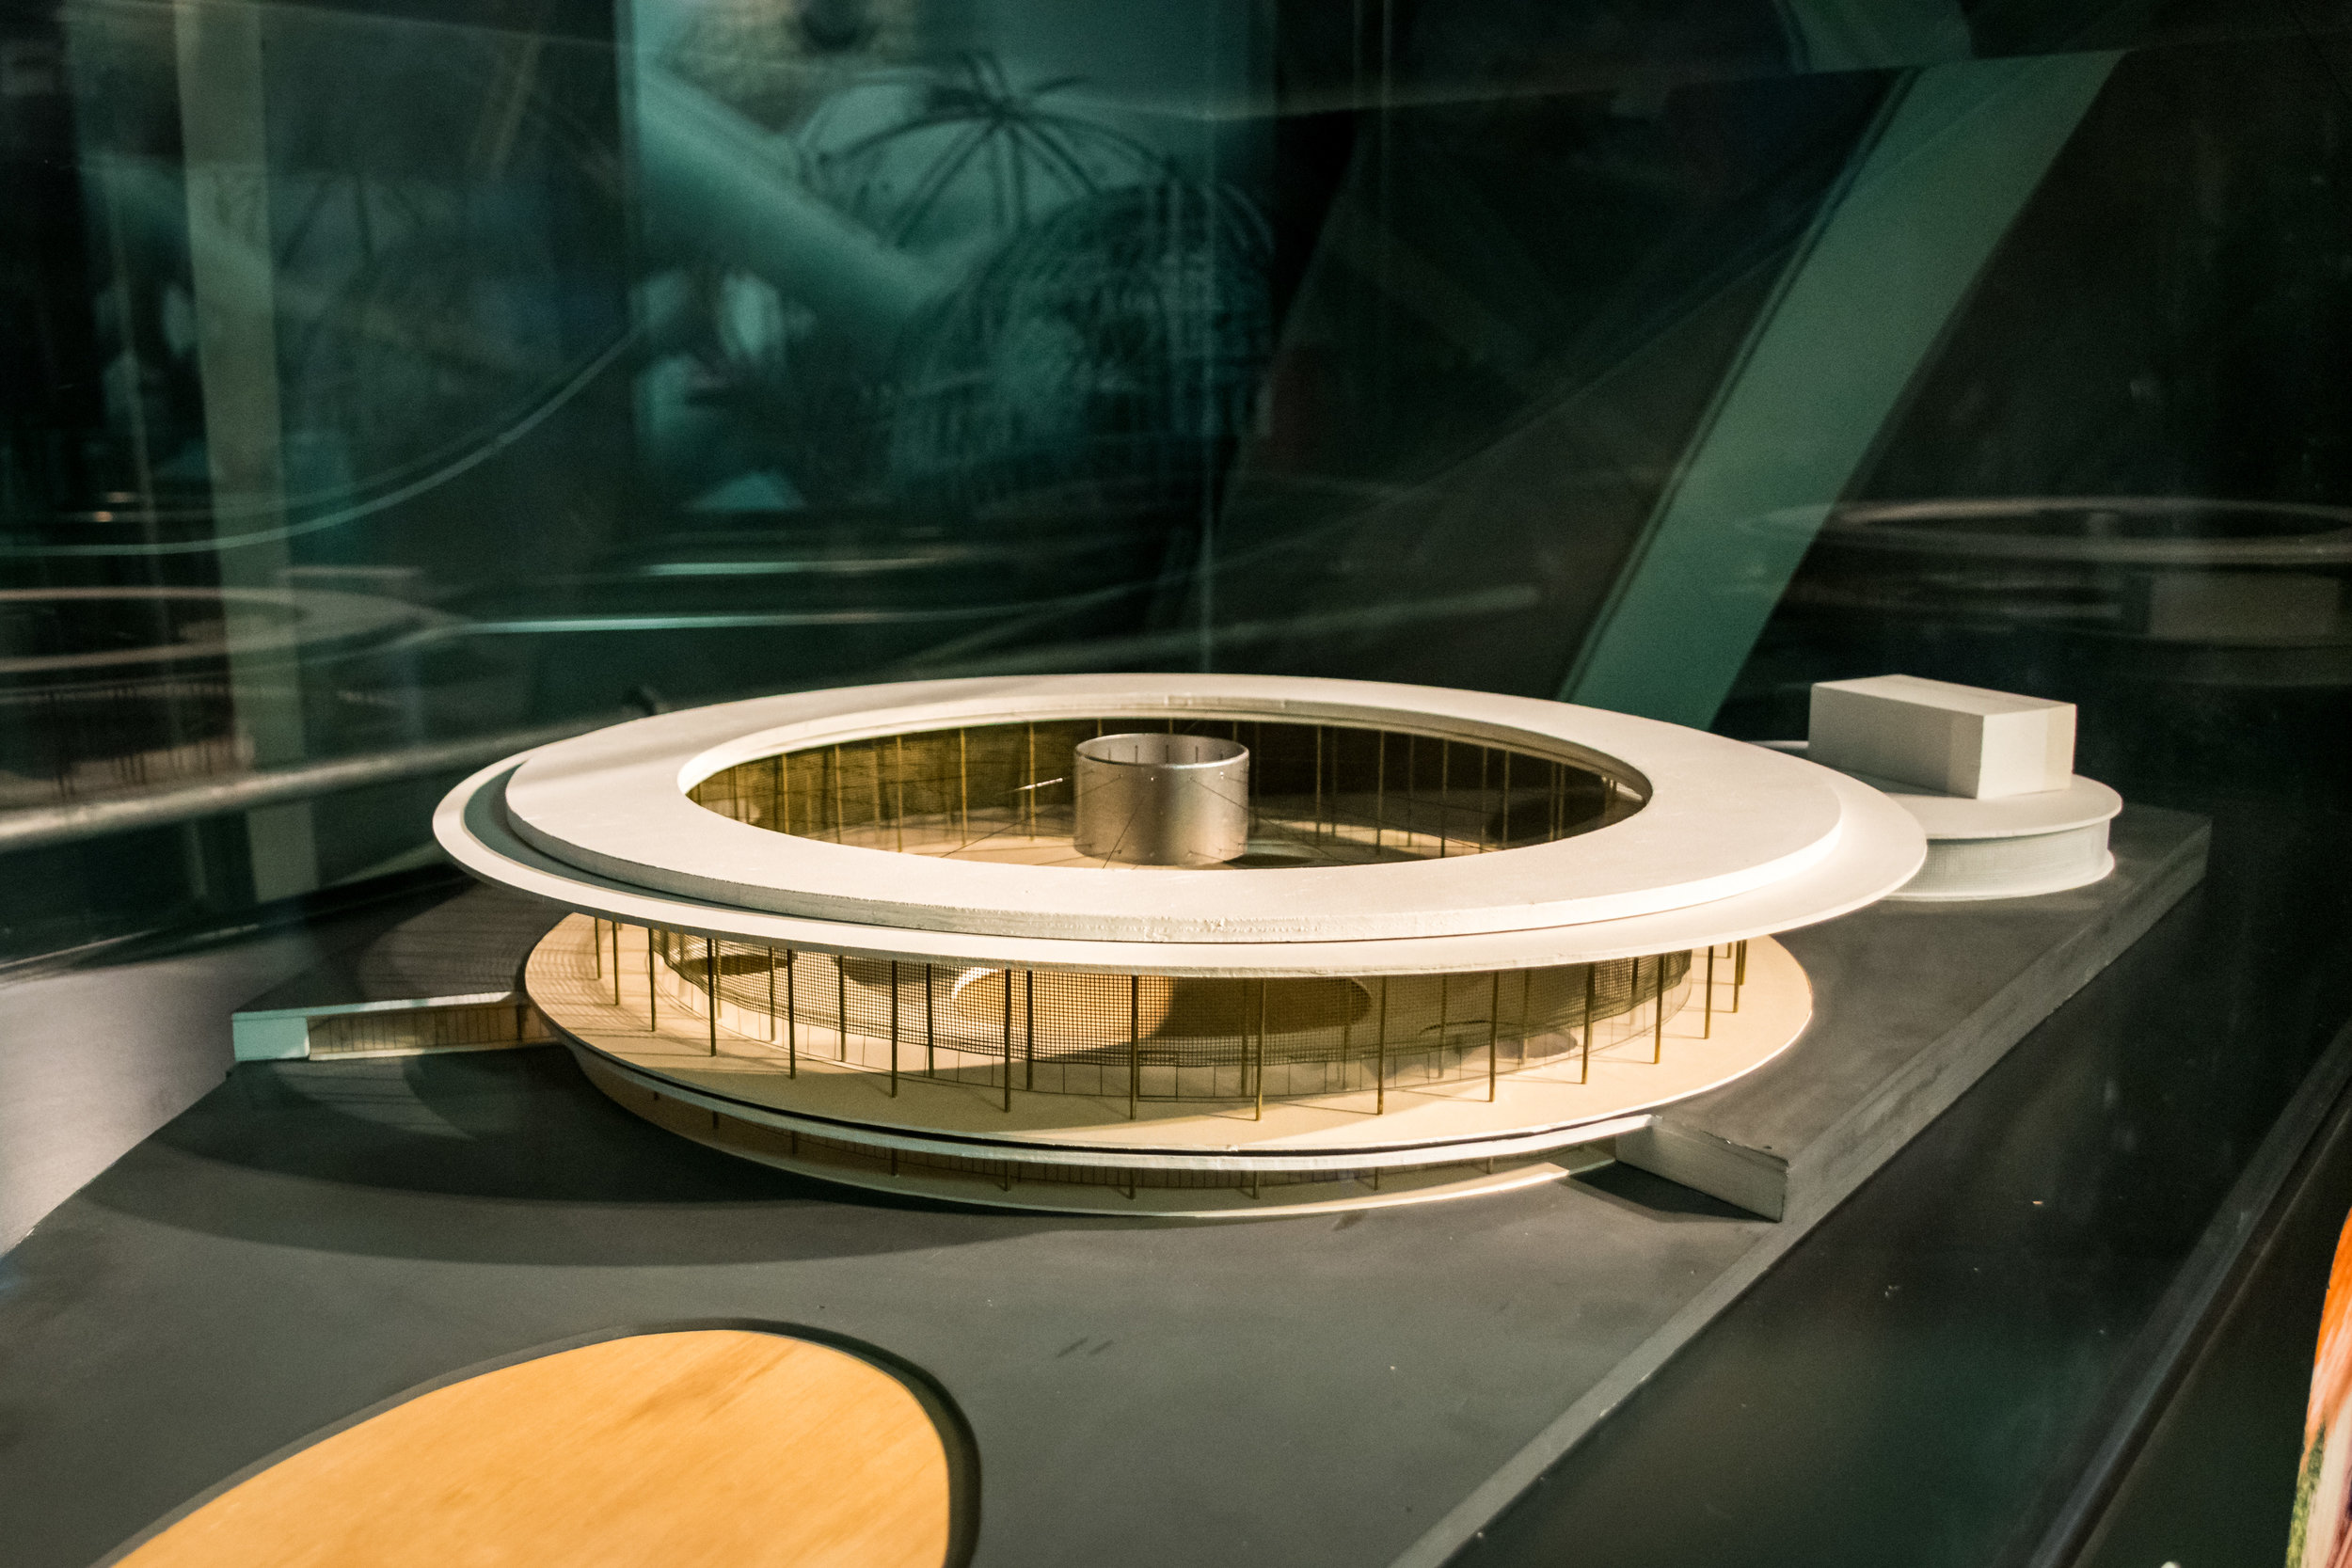 model of USA pavilion